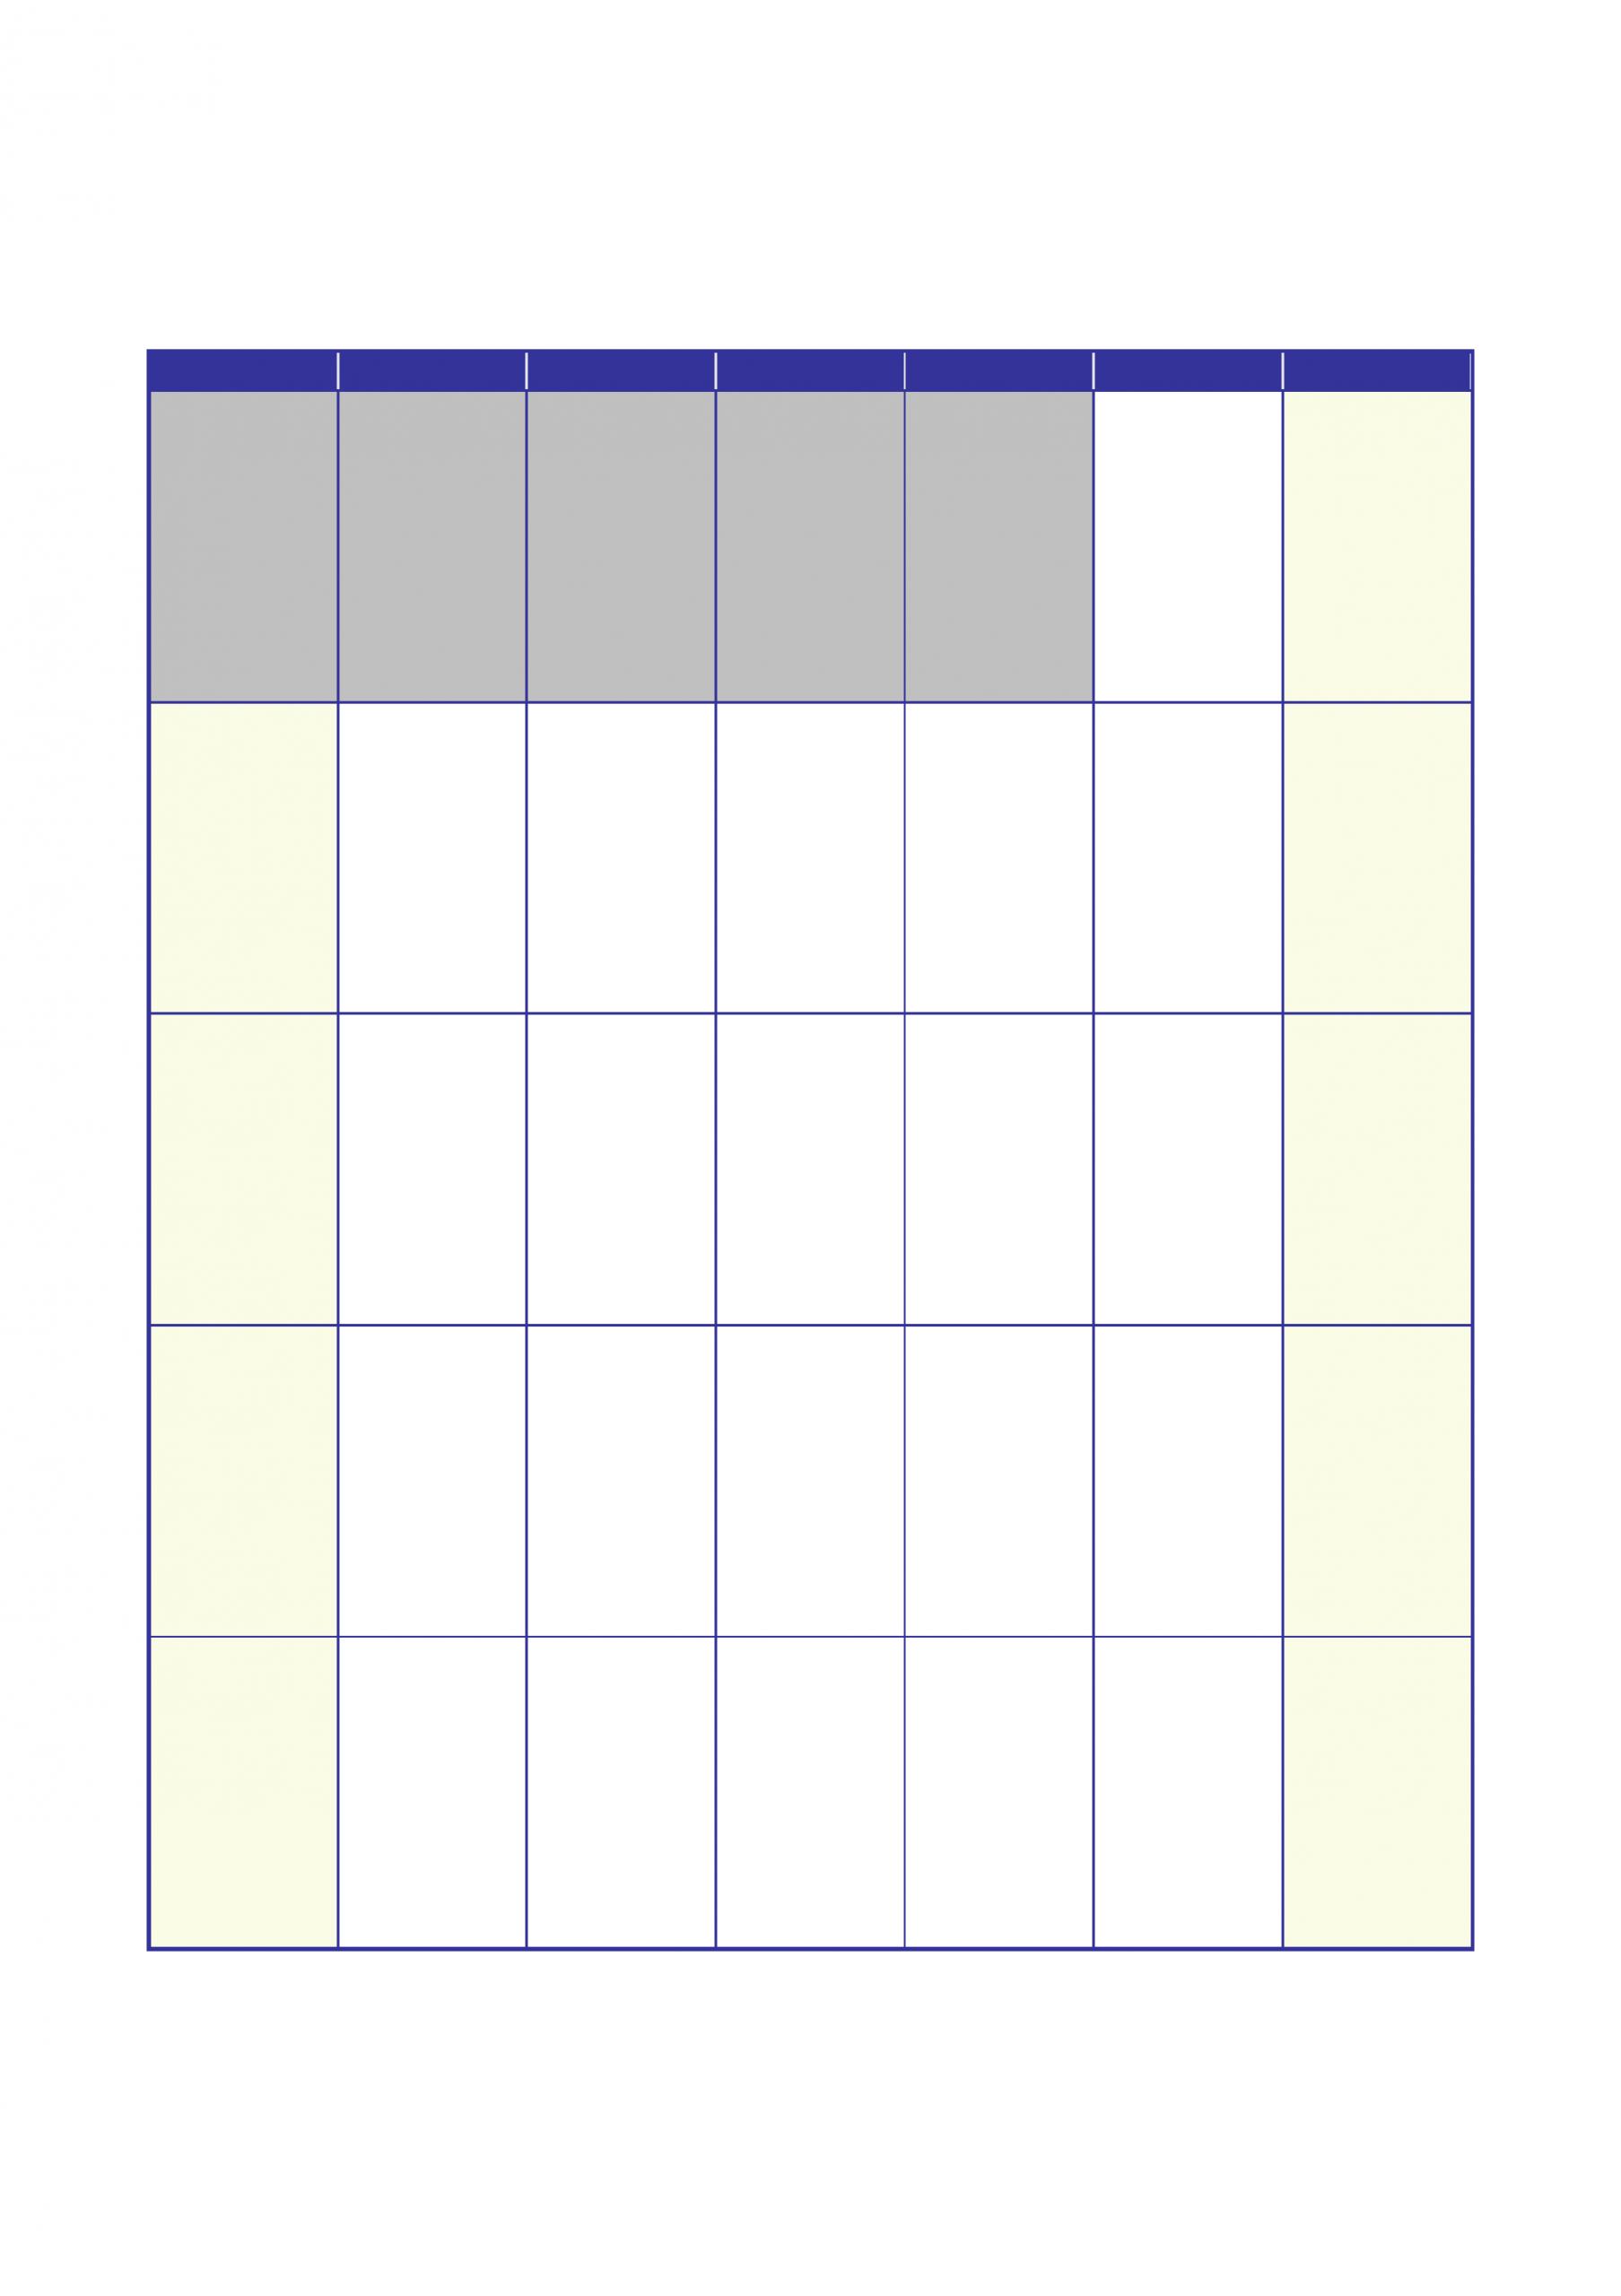 April 2016 Us Calendar With Holidays - Edit, Fill, Sign April Calendar That Can Be Edit